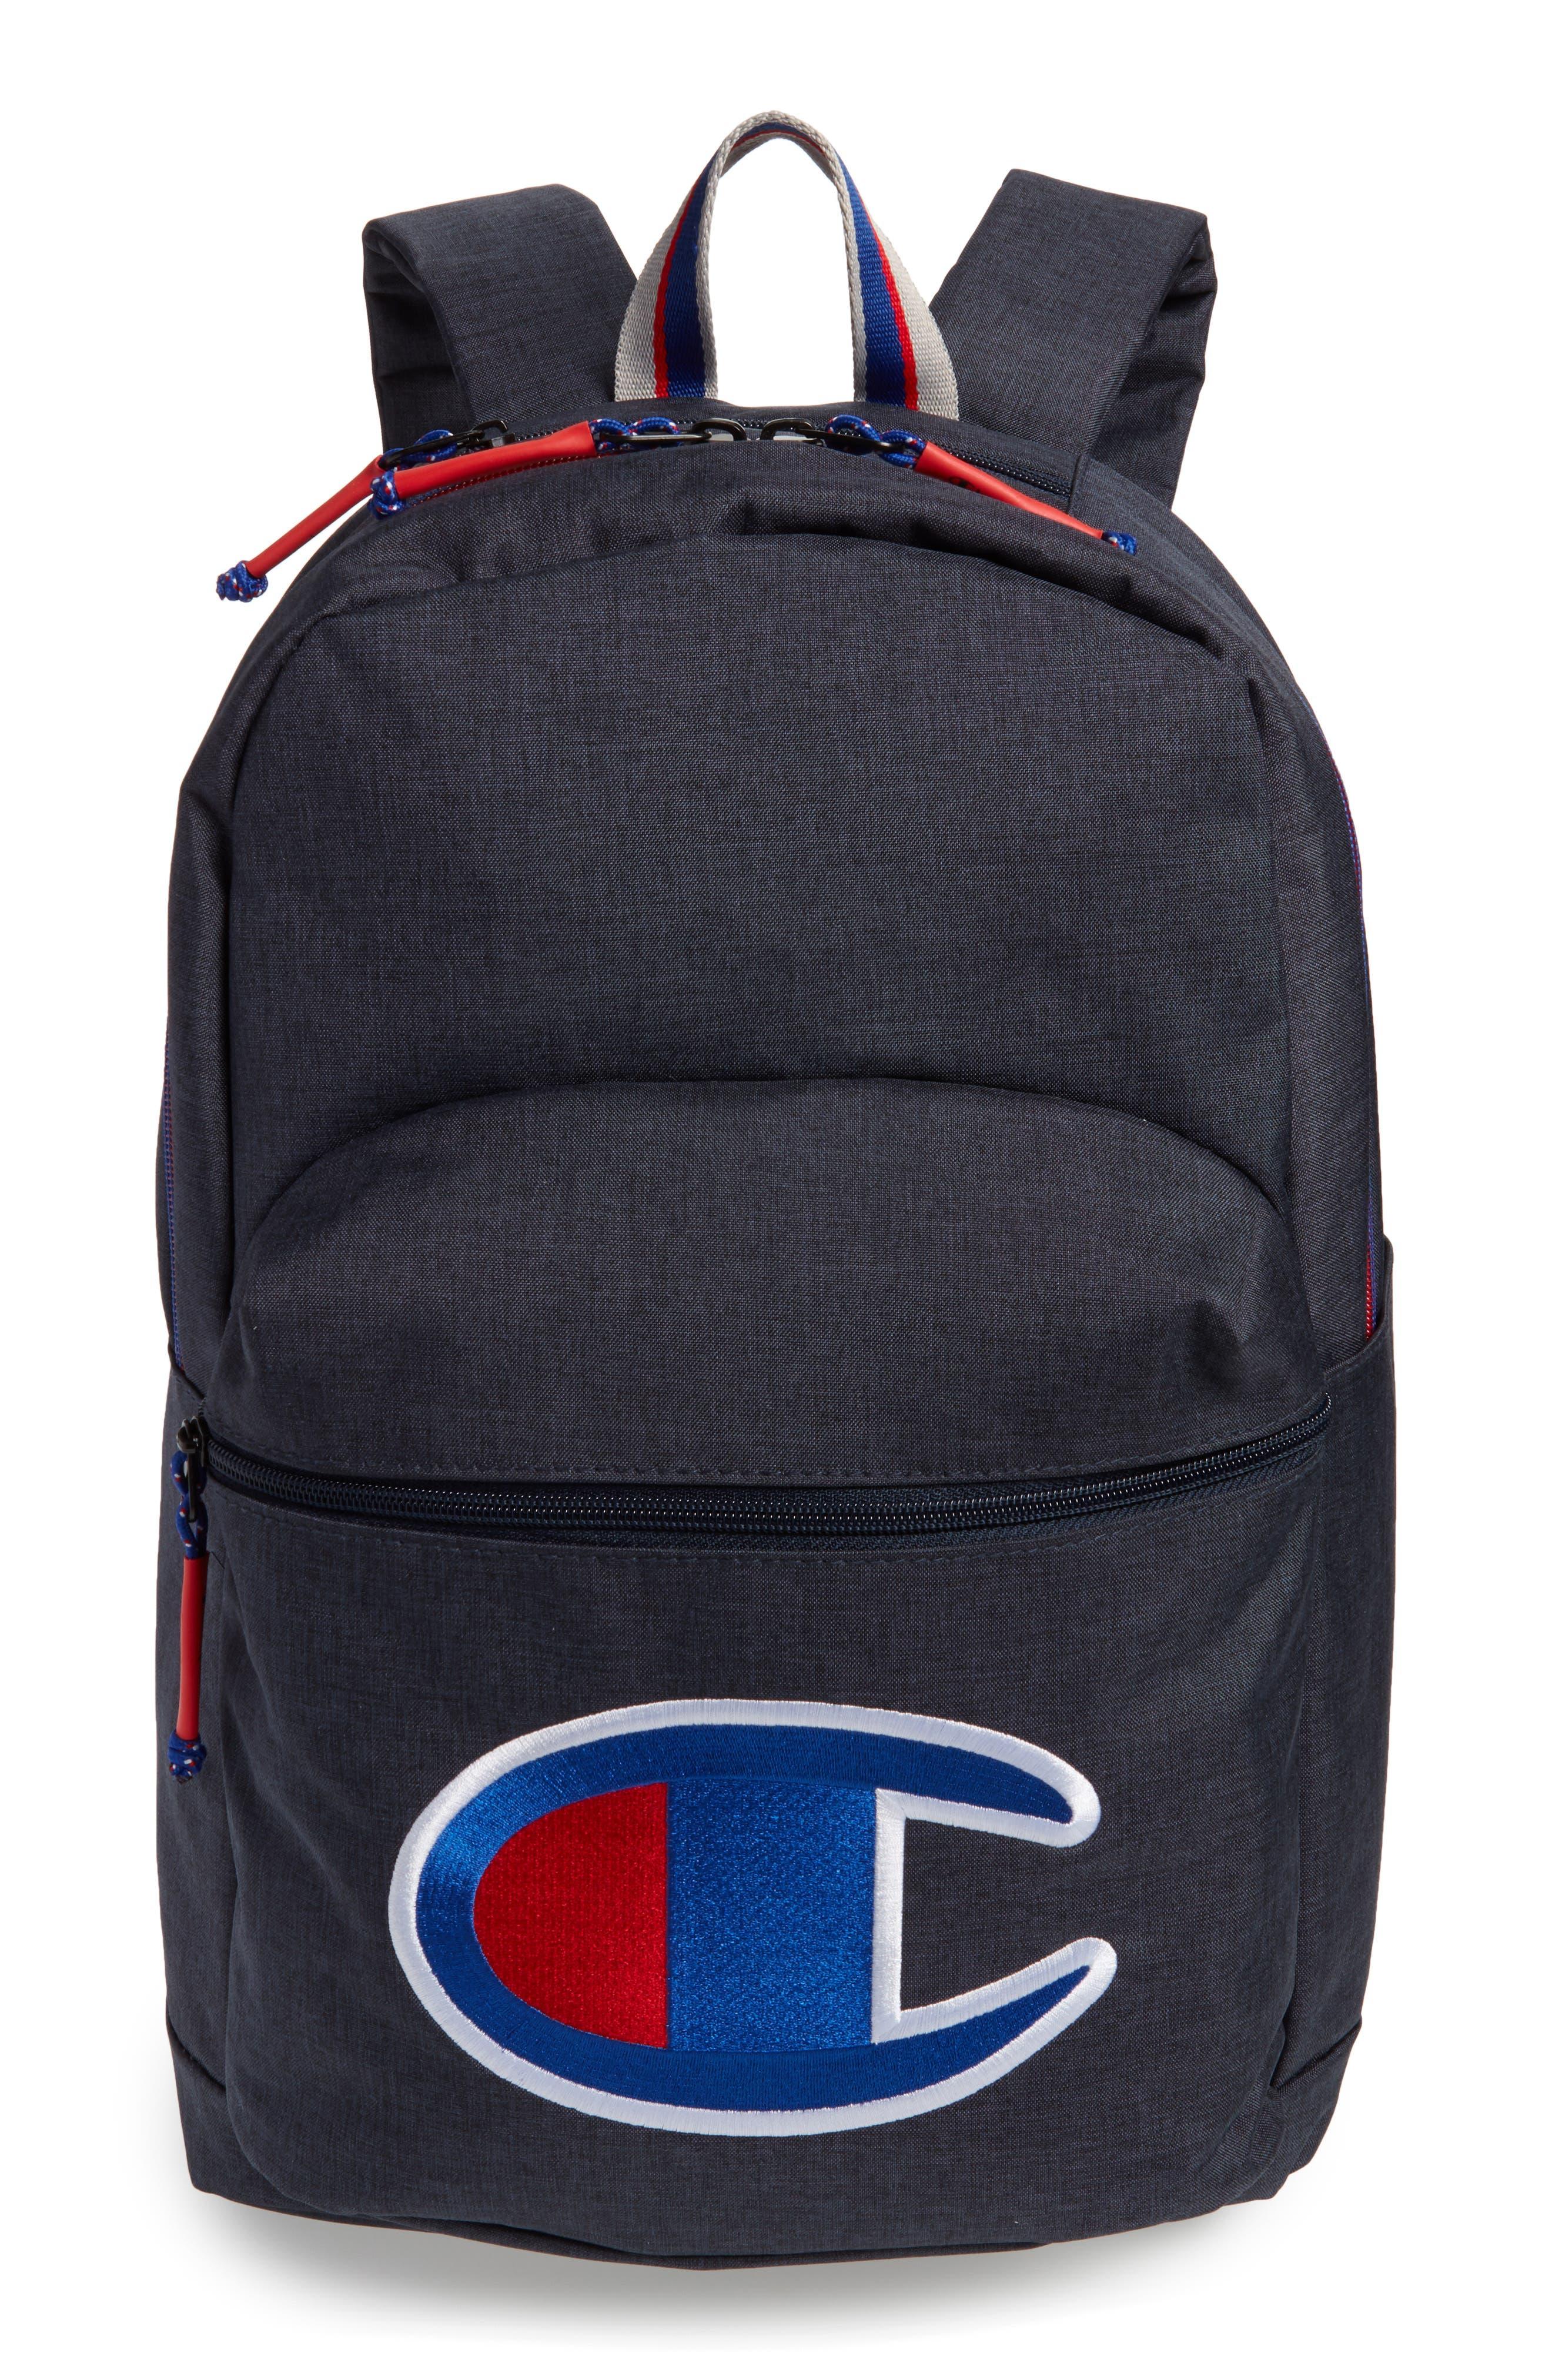 CHAMPION, Supercize Backpack, Main thumbnail 1, color, 410